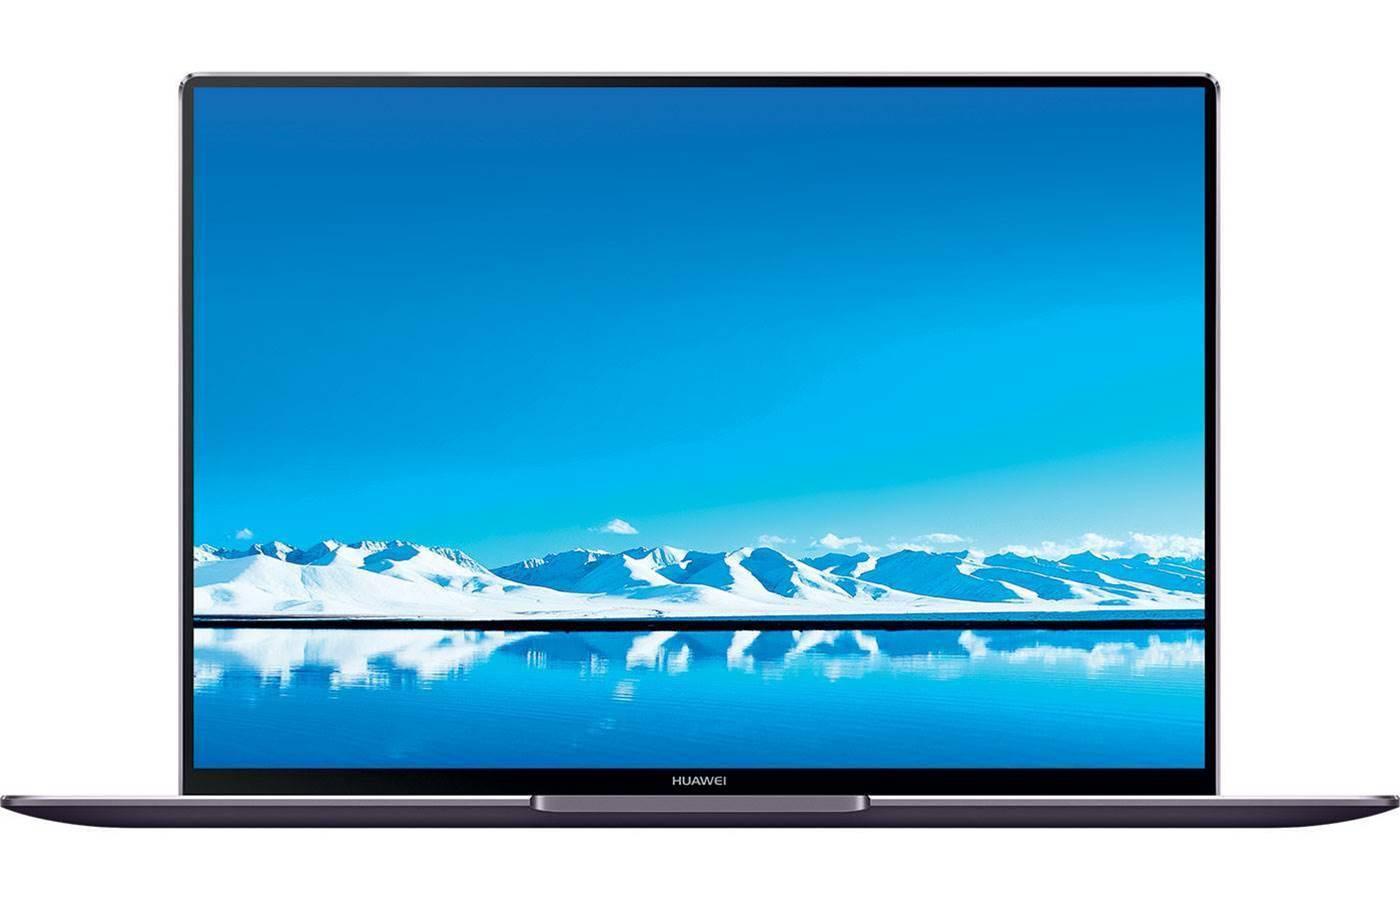 Hands-on: Huawei Matebook X Pro